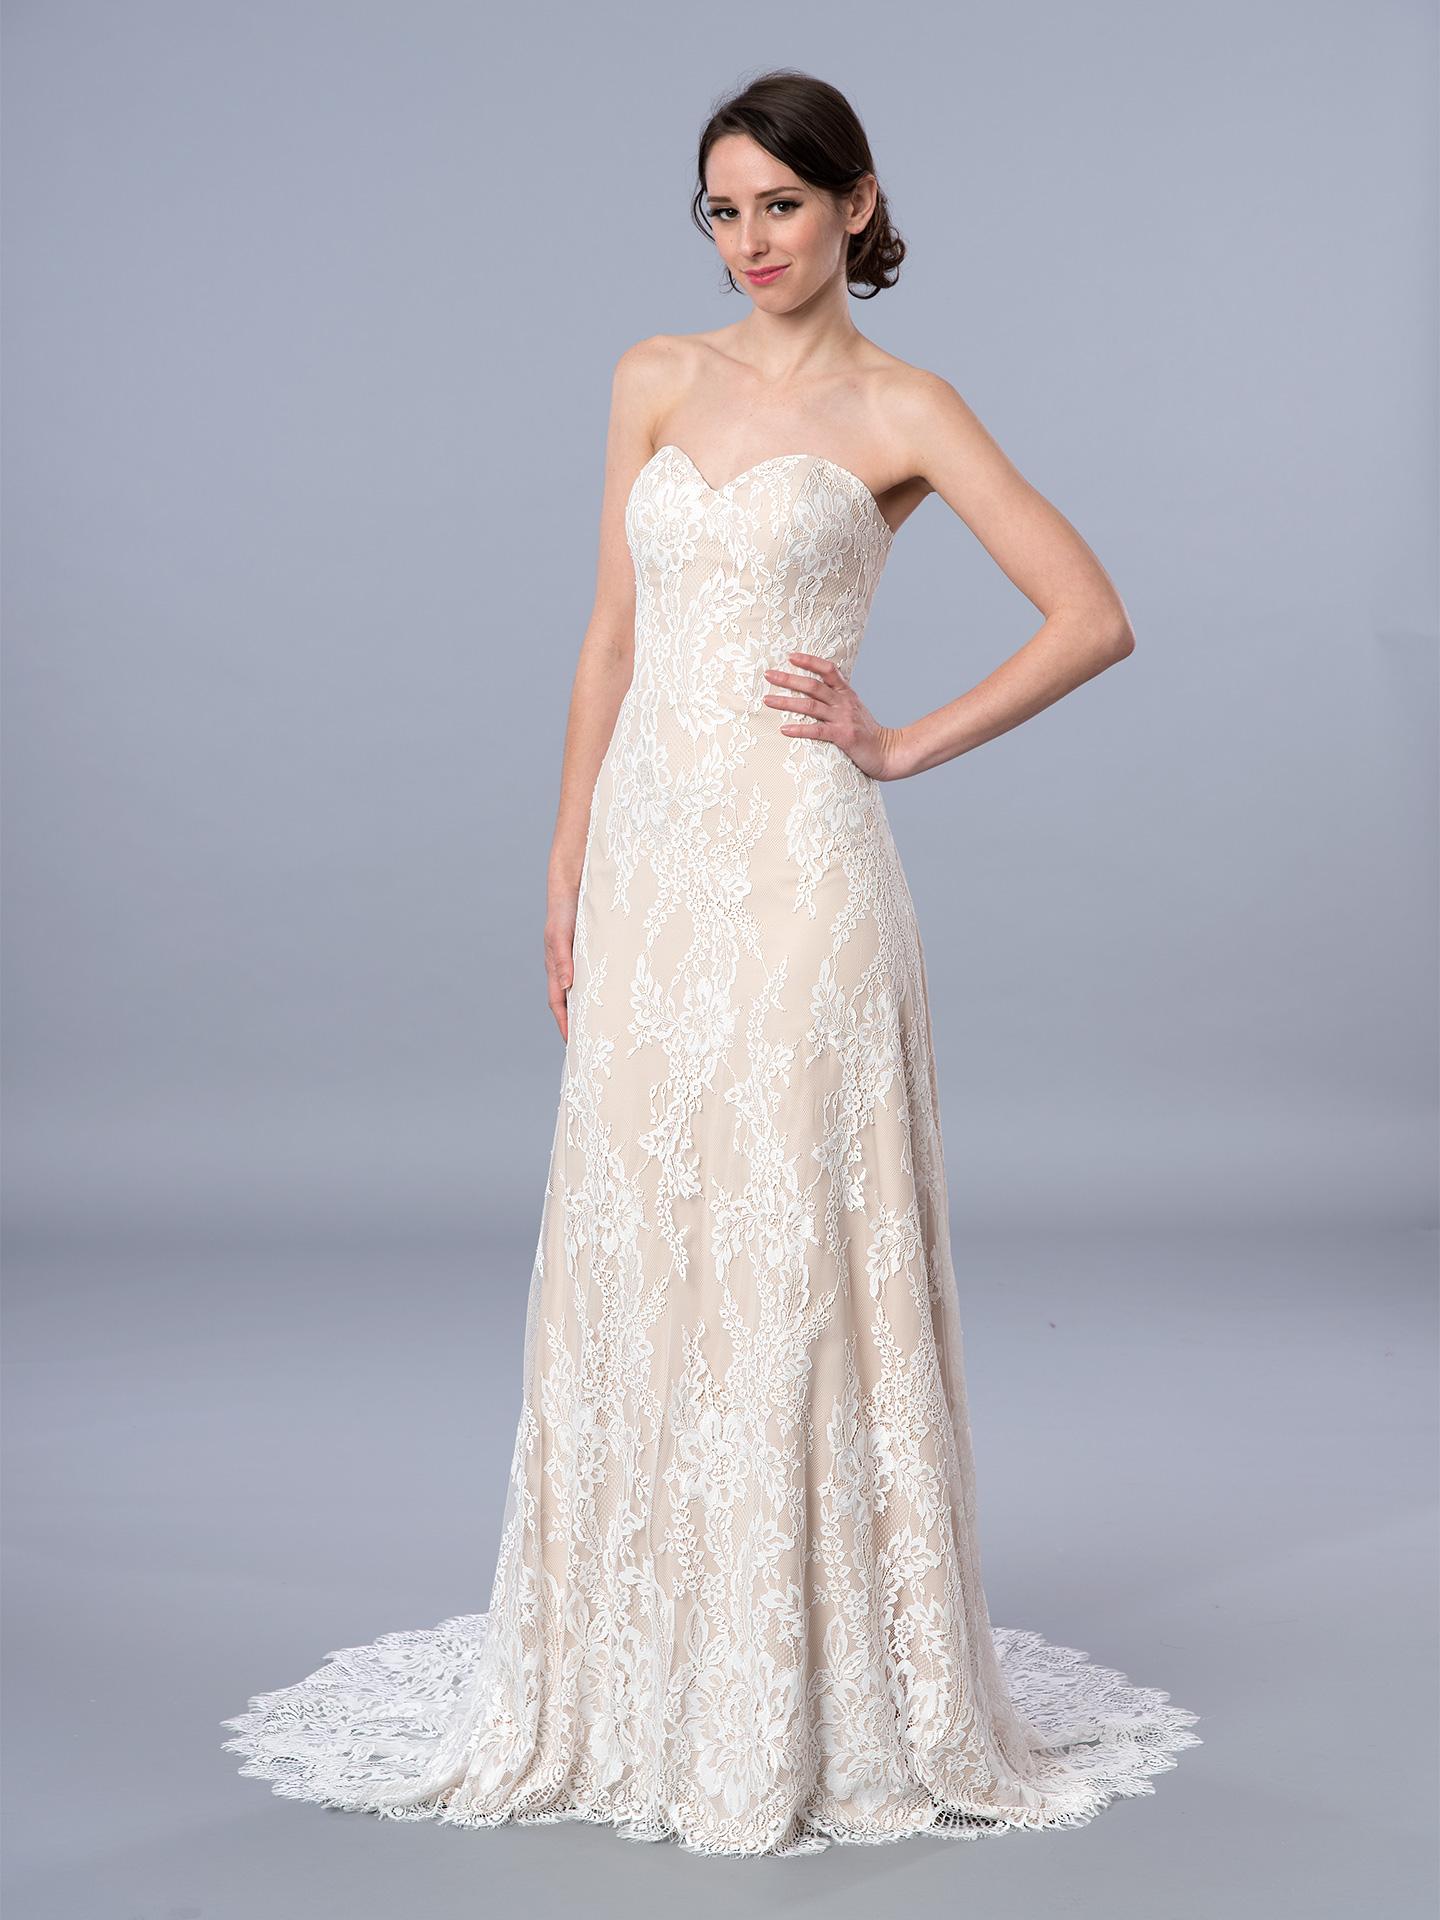 Boho Style Strapless Lace Wedding Dress 4064 Wedding Dress 4